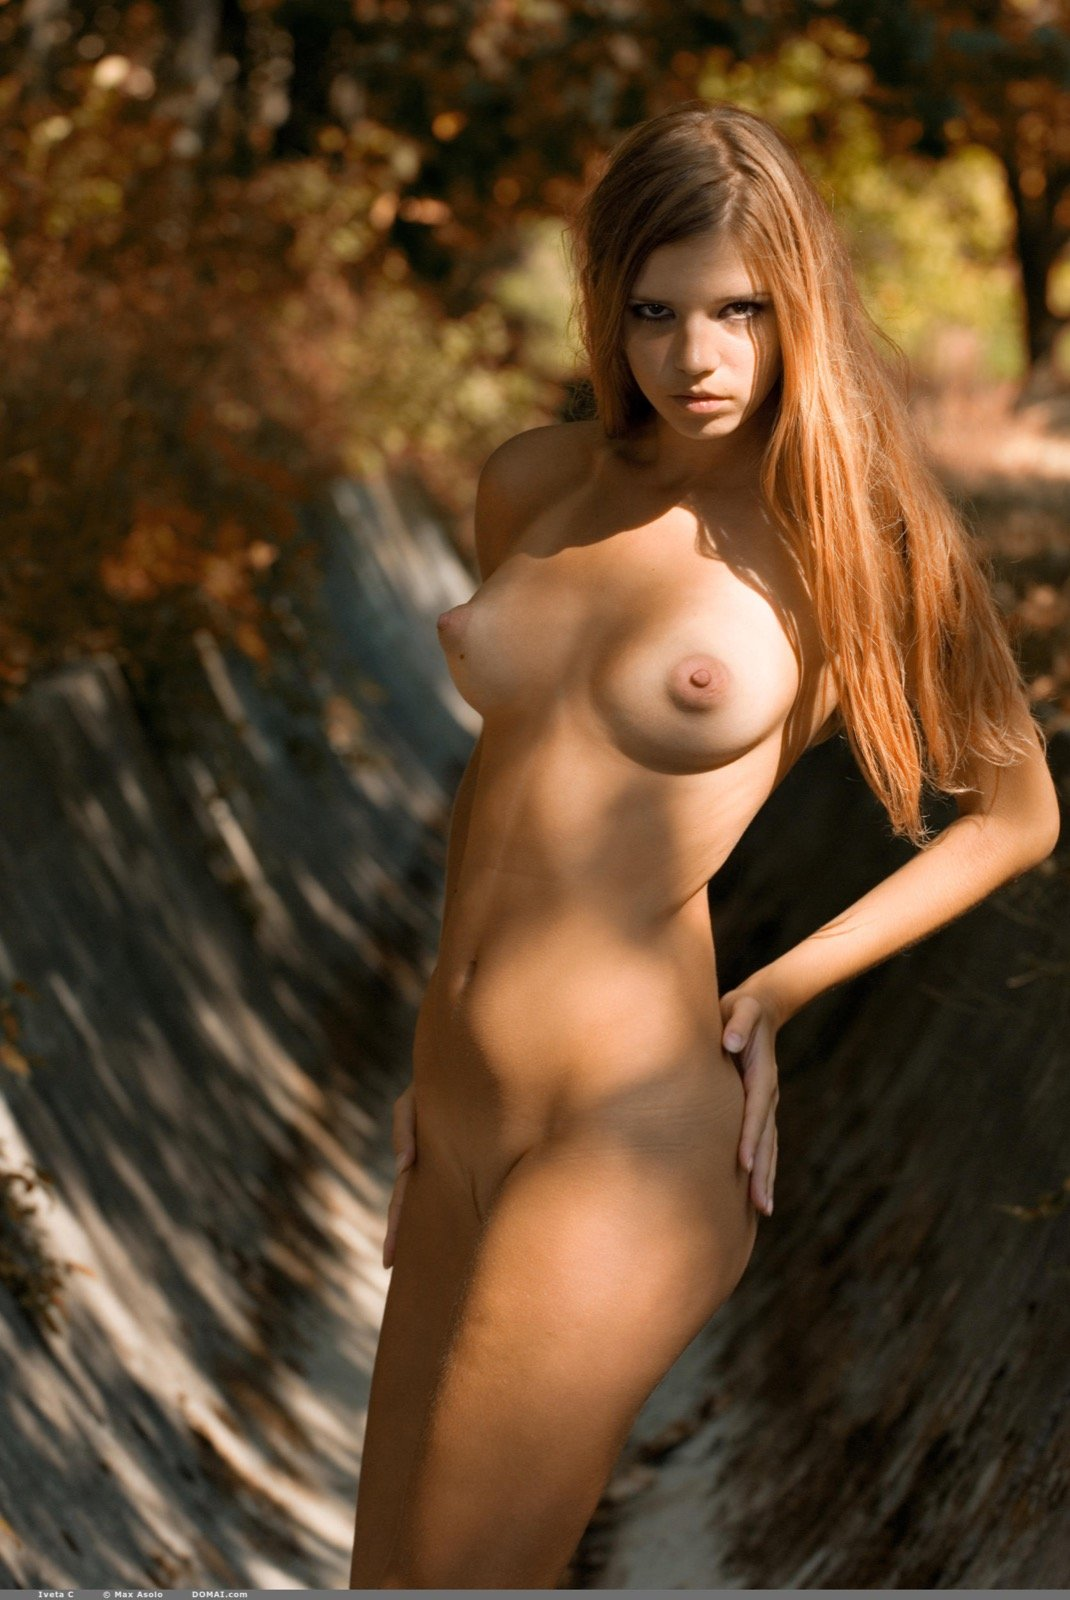 Красавица ходит голая в осеннем парке секс фото